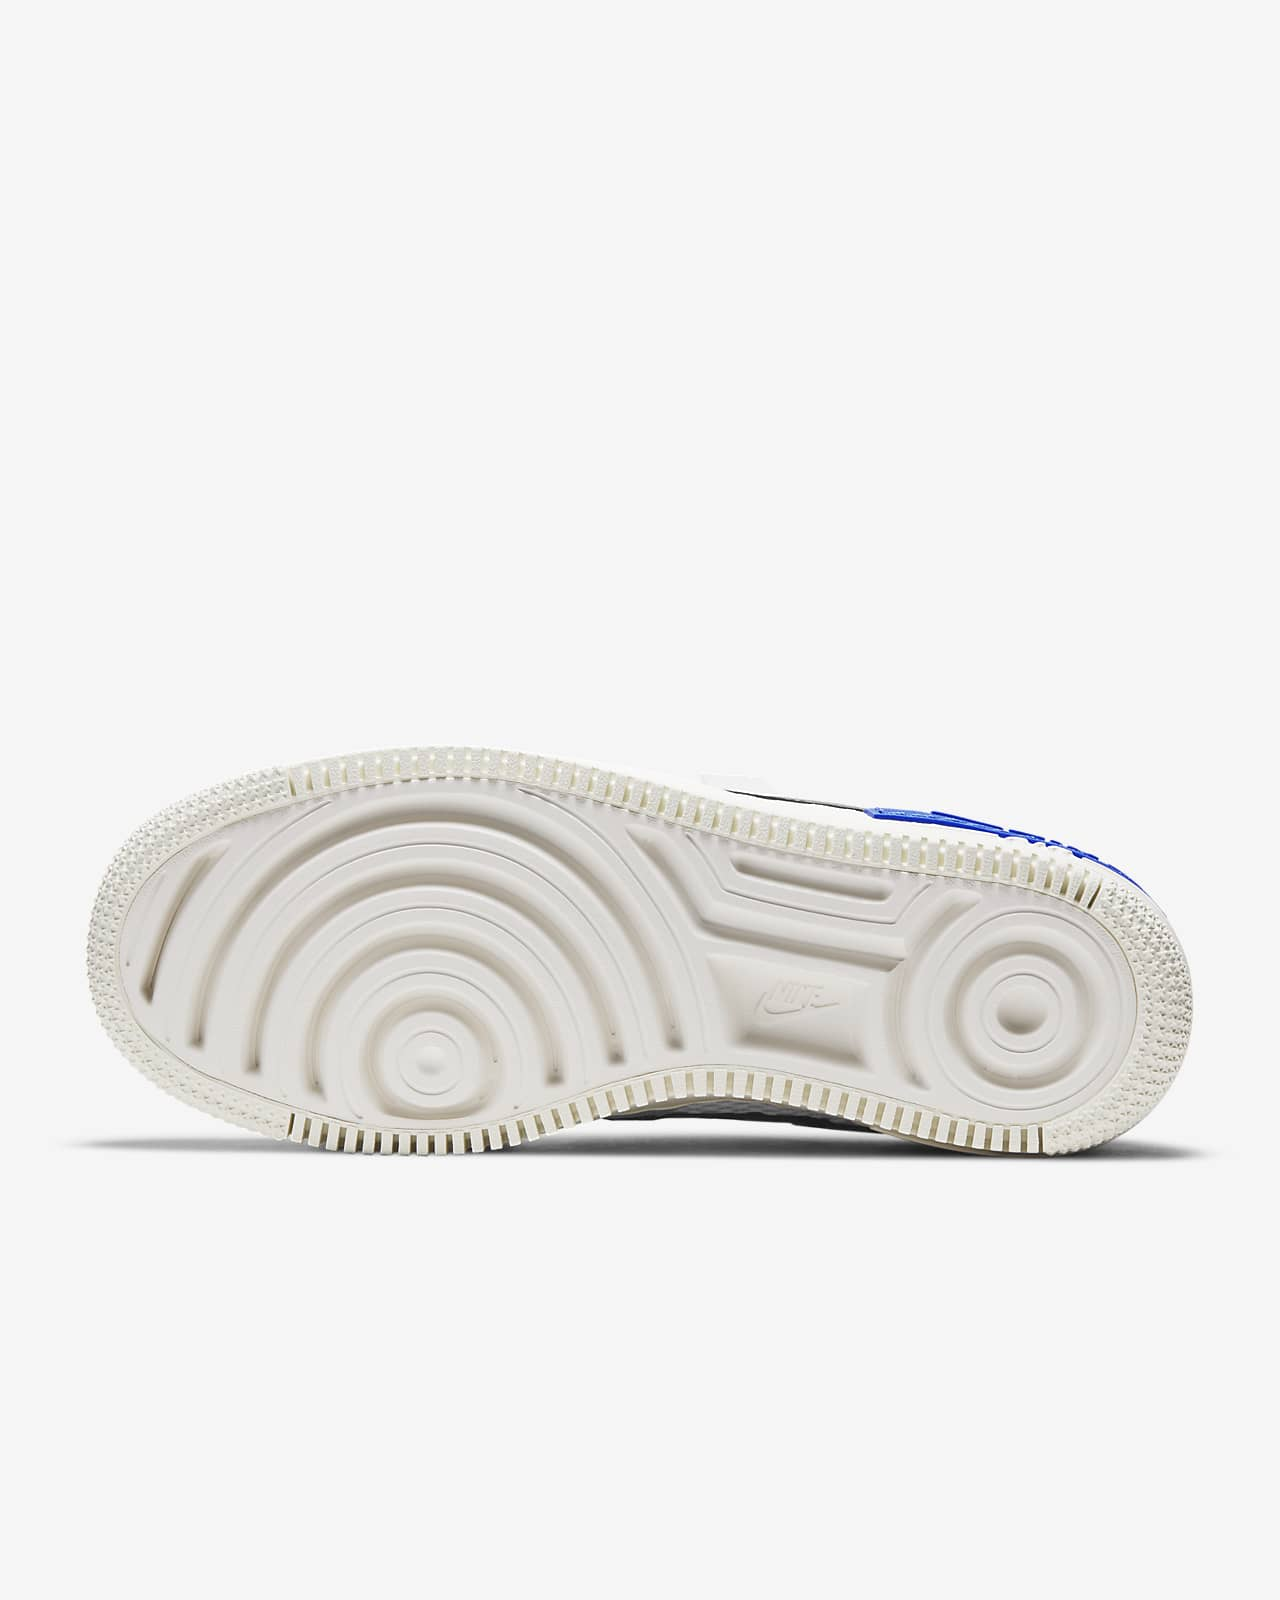 Nike Air Force 1 Shadow Women S Shoe Nike Com Layered pieces add rich texture. nike air force 1 shadow women s shoe